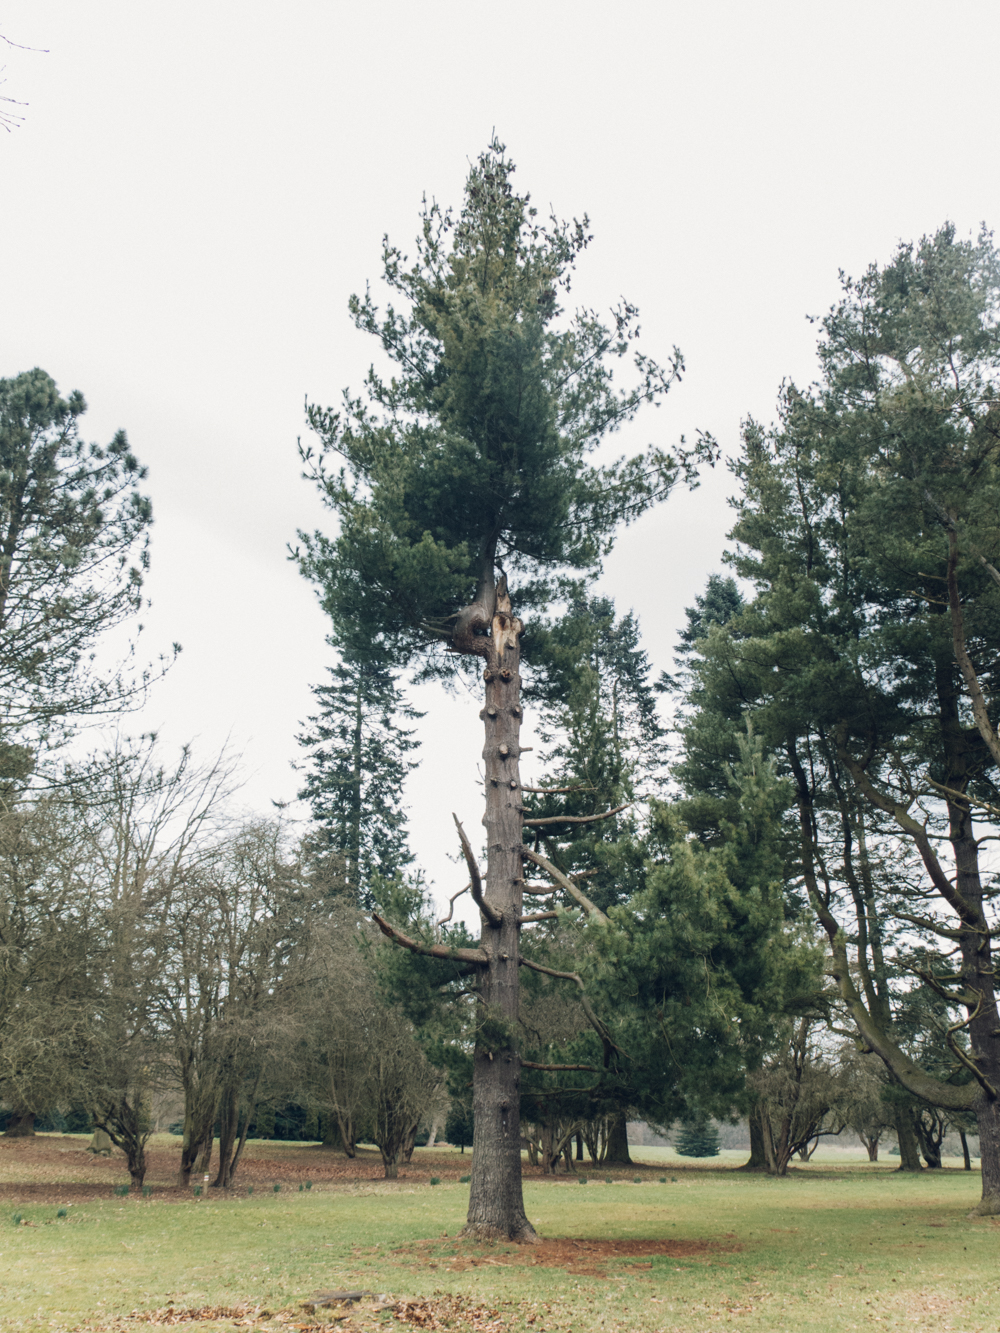 Haarkon Clumber Park Sherwood Forest National Trust Glasshouse Greenhouse Garden Plants Tree Woods Leaf Pine